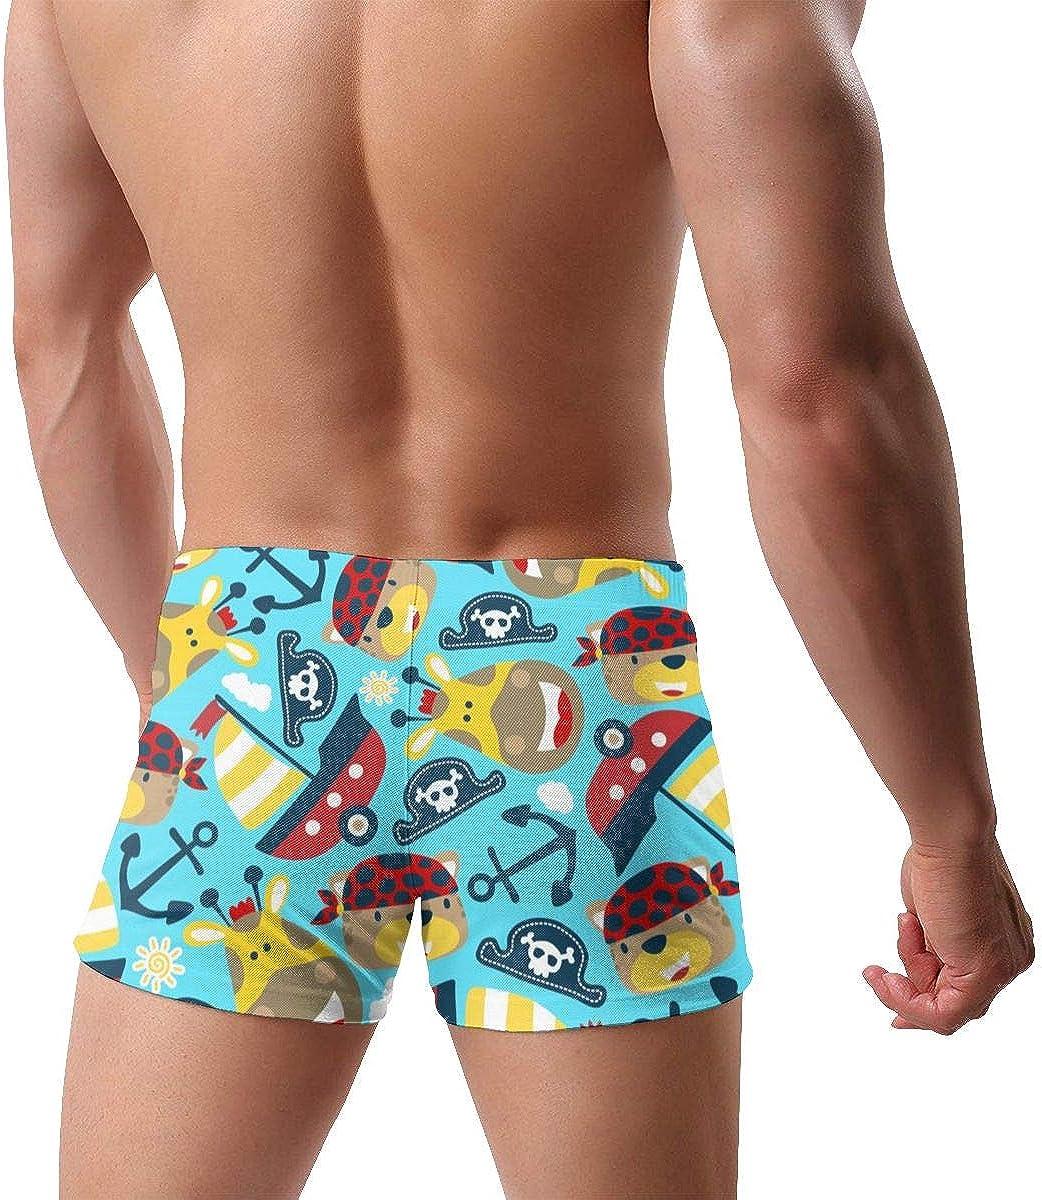 Sailboat Anchor Pirate Hat Men's Swimming Trunks Fitness Swimwear Boxer Pants Board Shorts